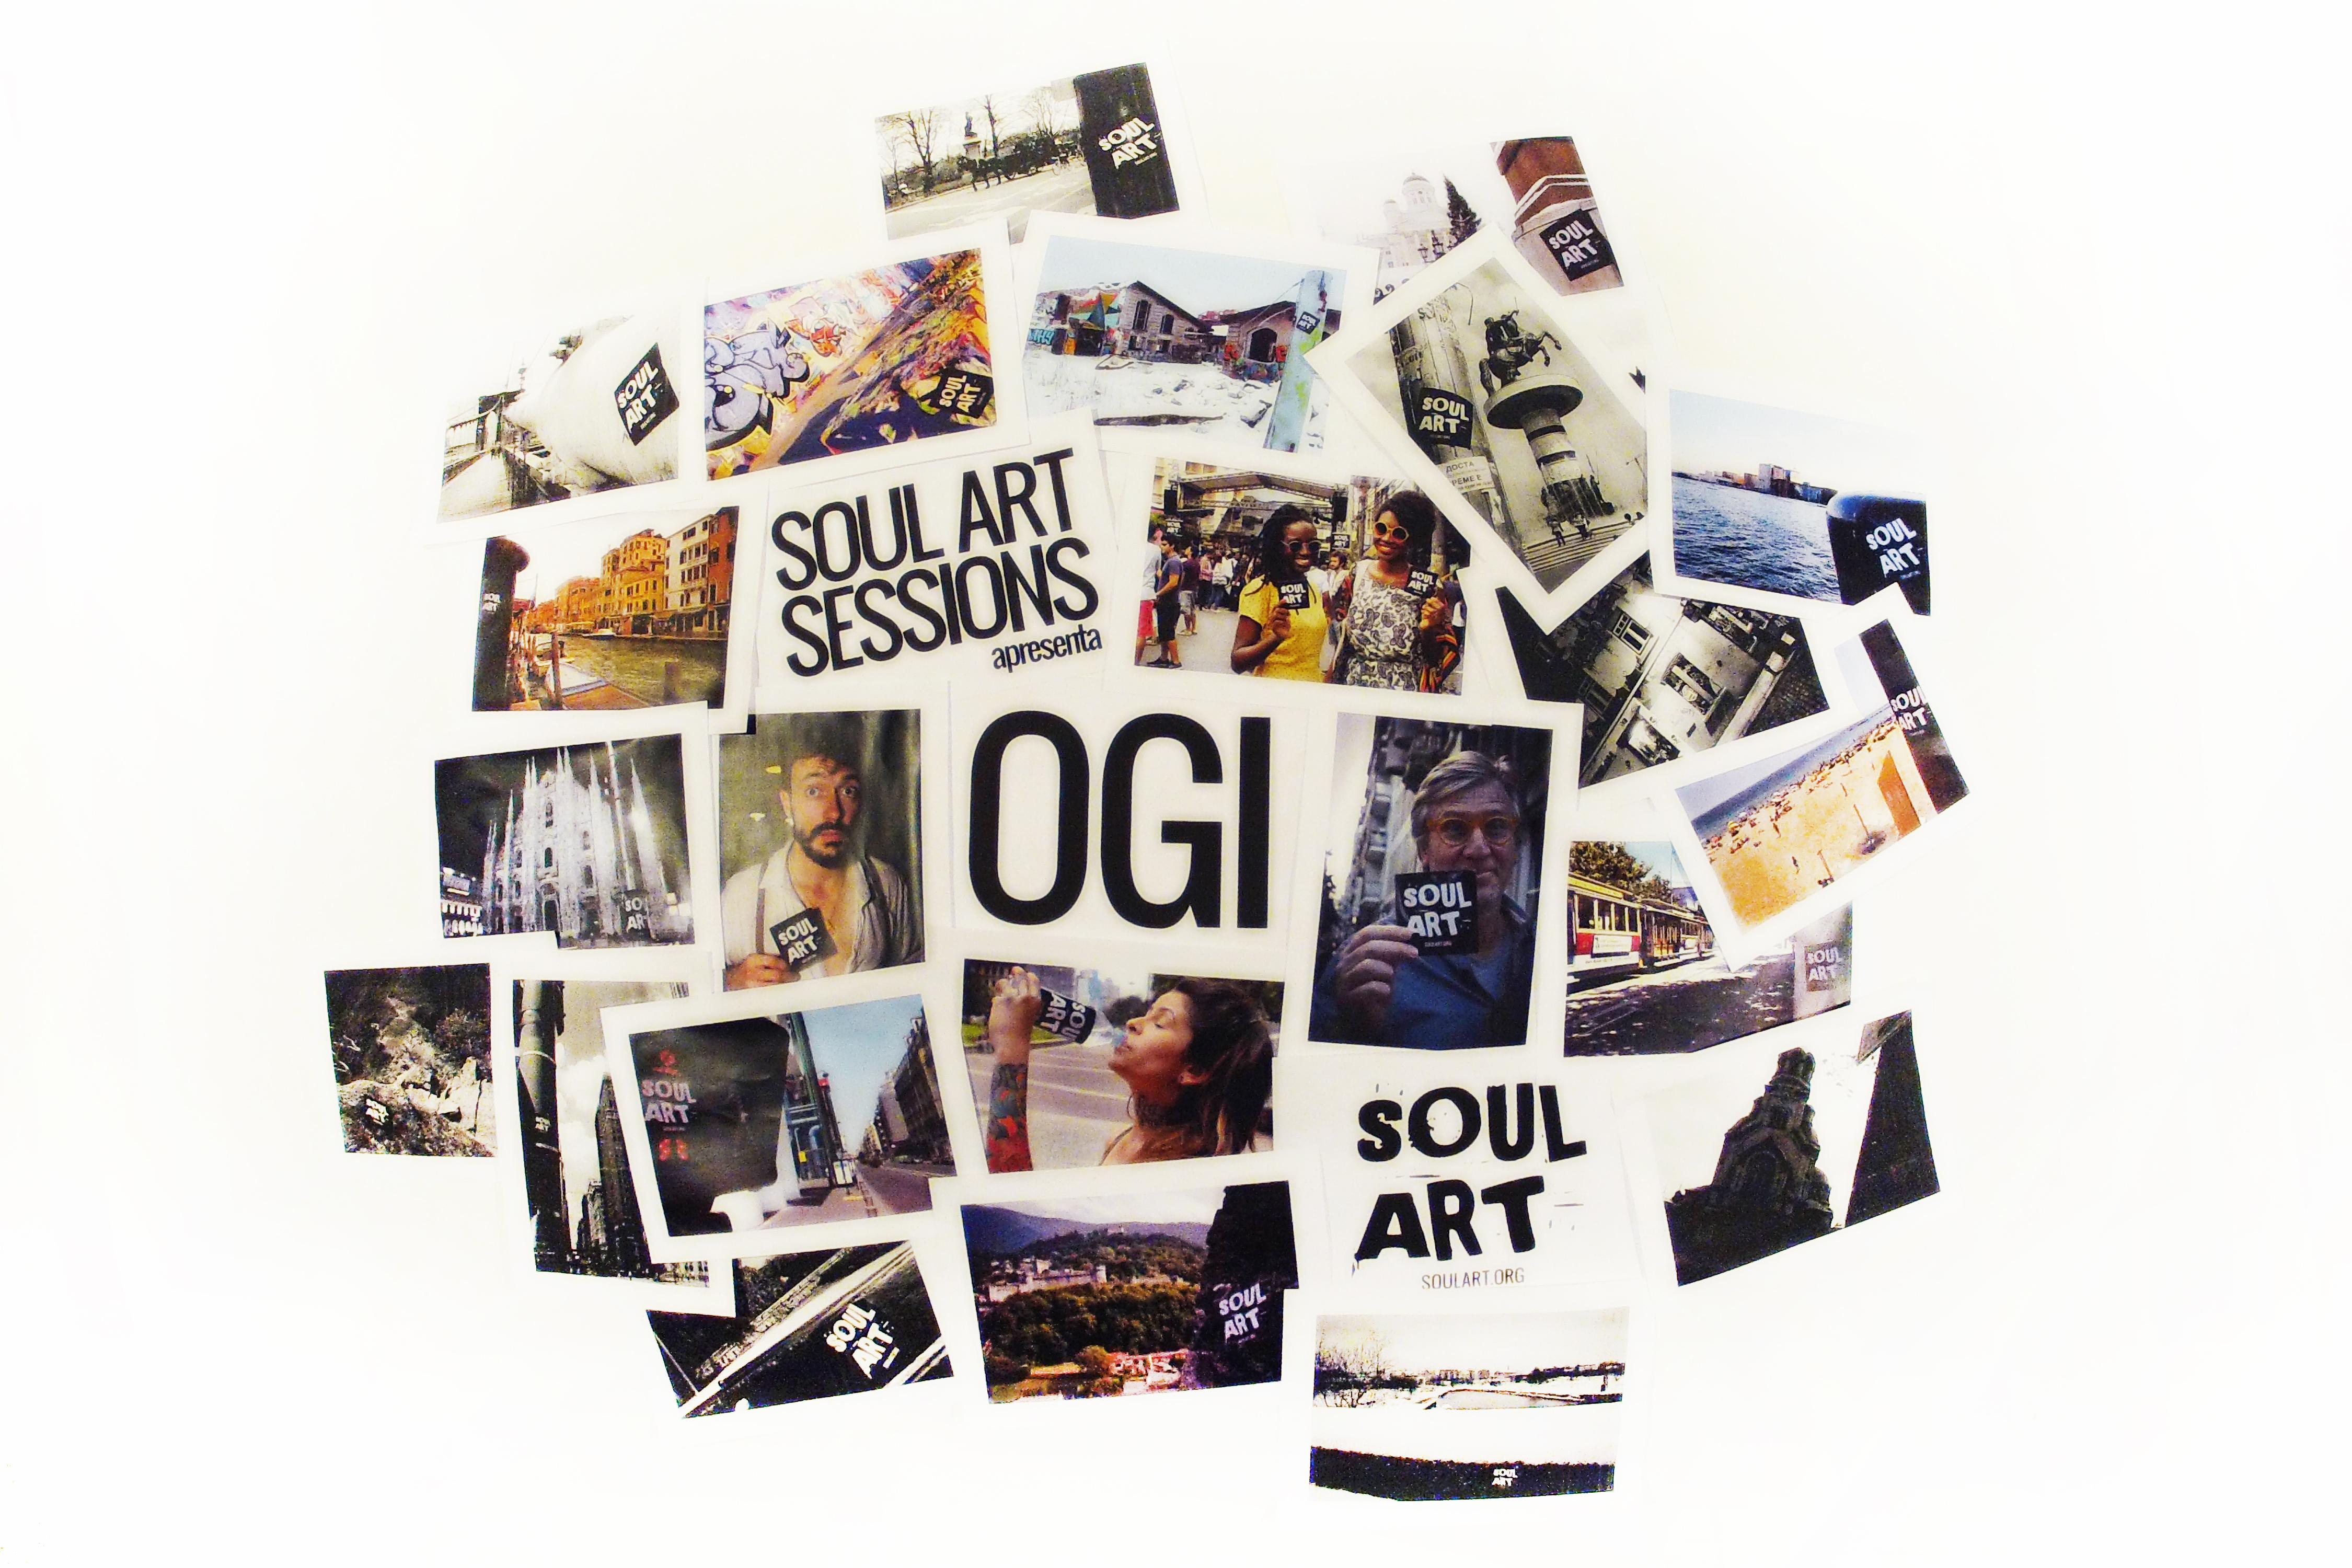 SOUL ART SESSIONS - Ogi canta - Minha Sorte Mudou